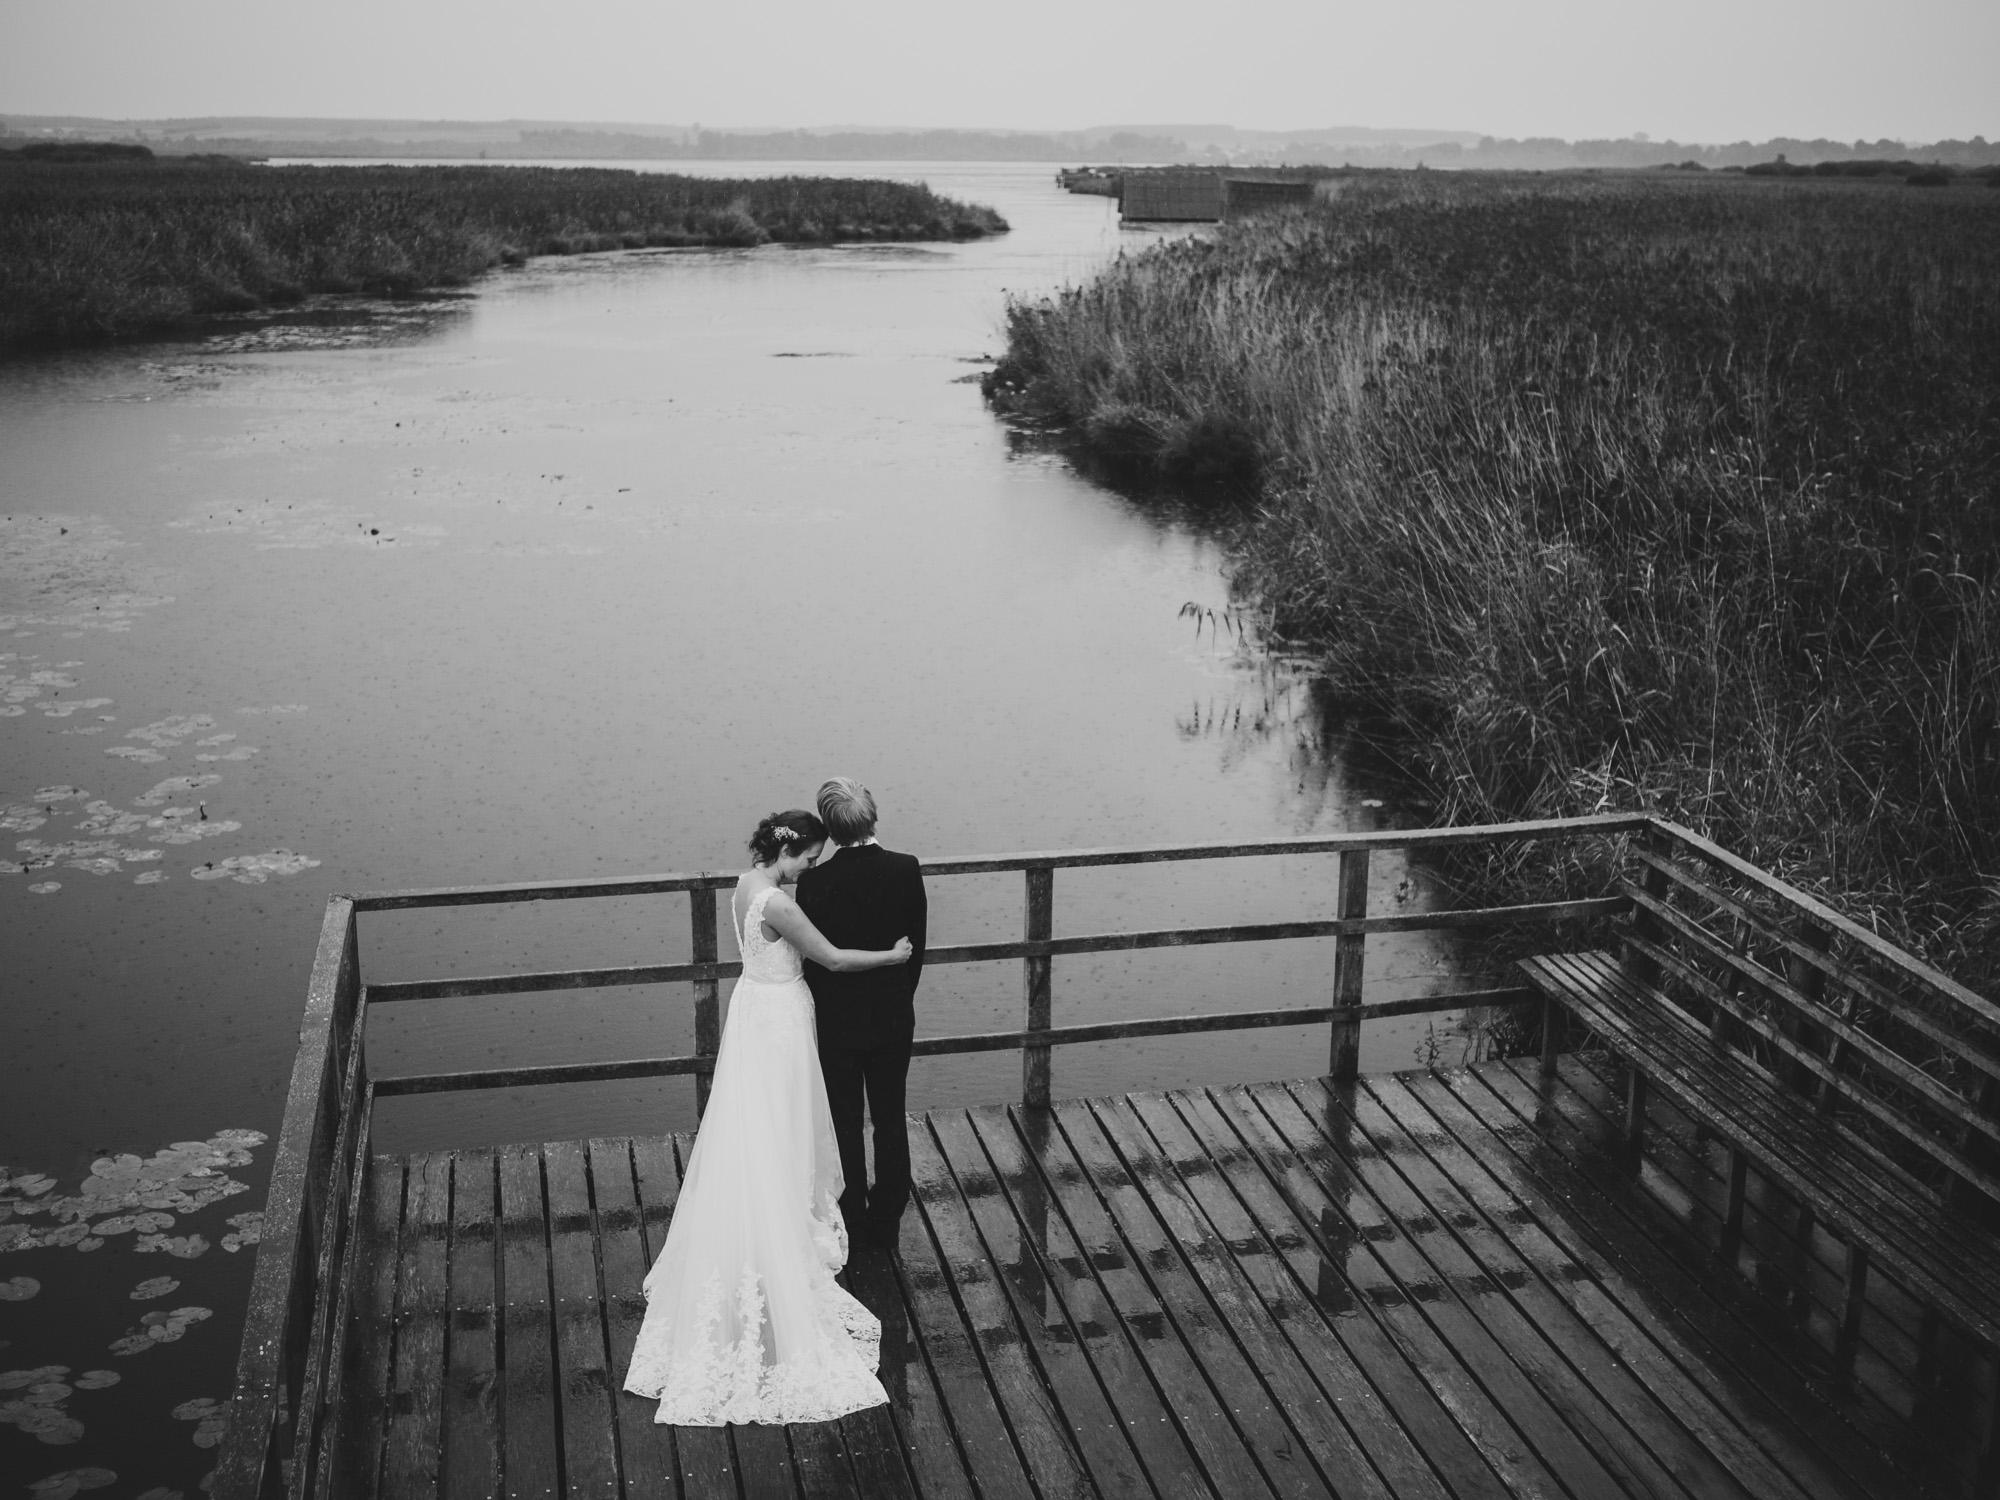 Hochzeit-Memory-factory-20170909-0022.jpg